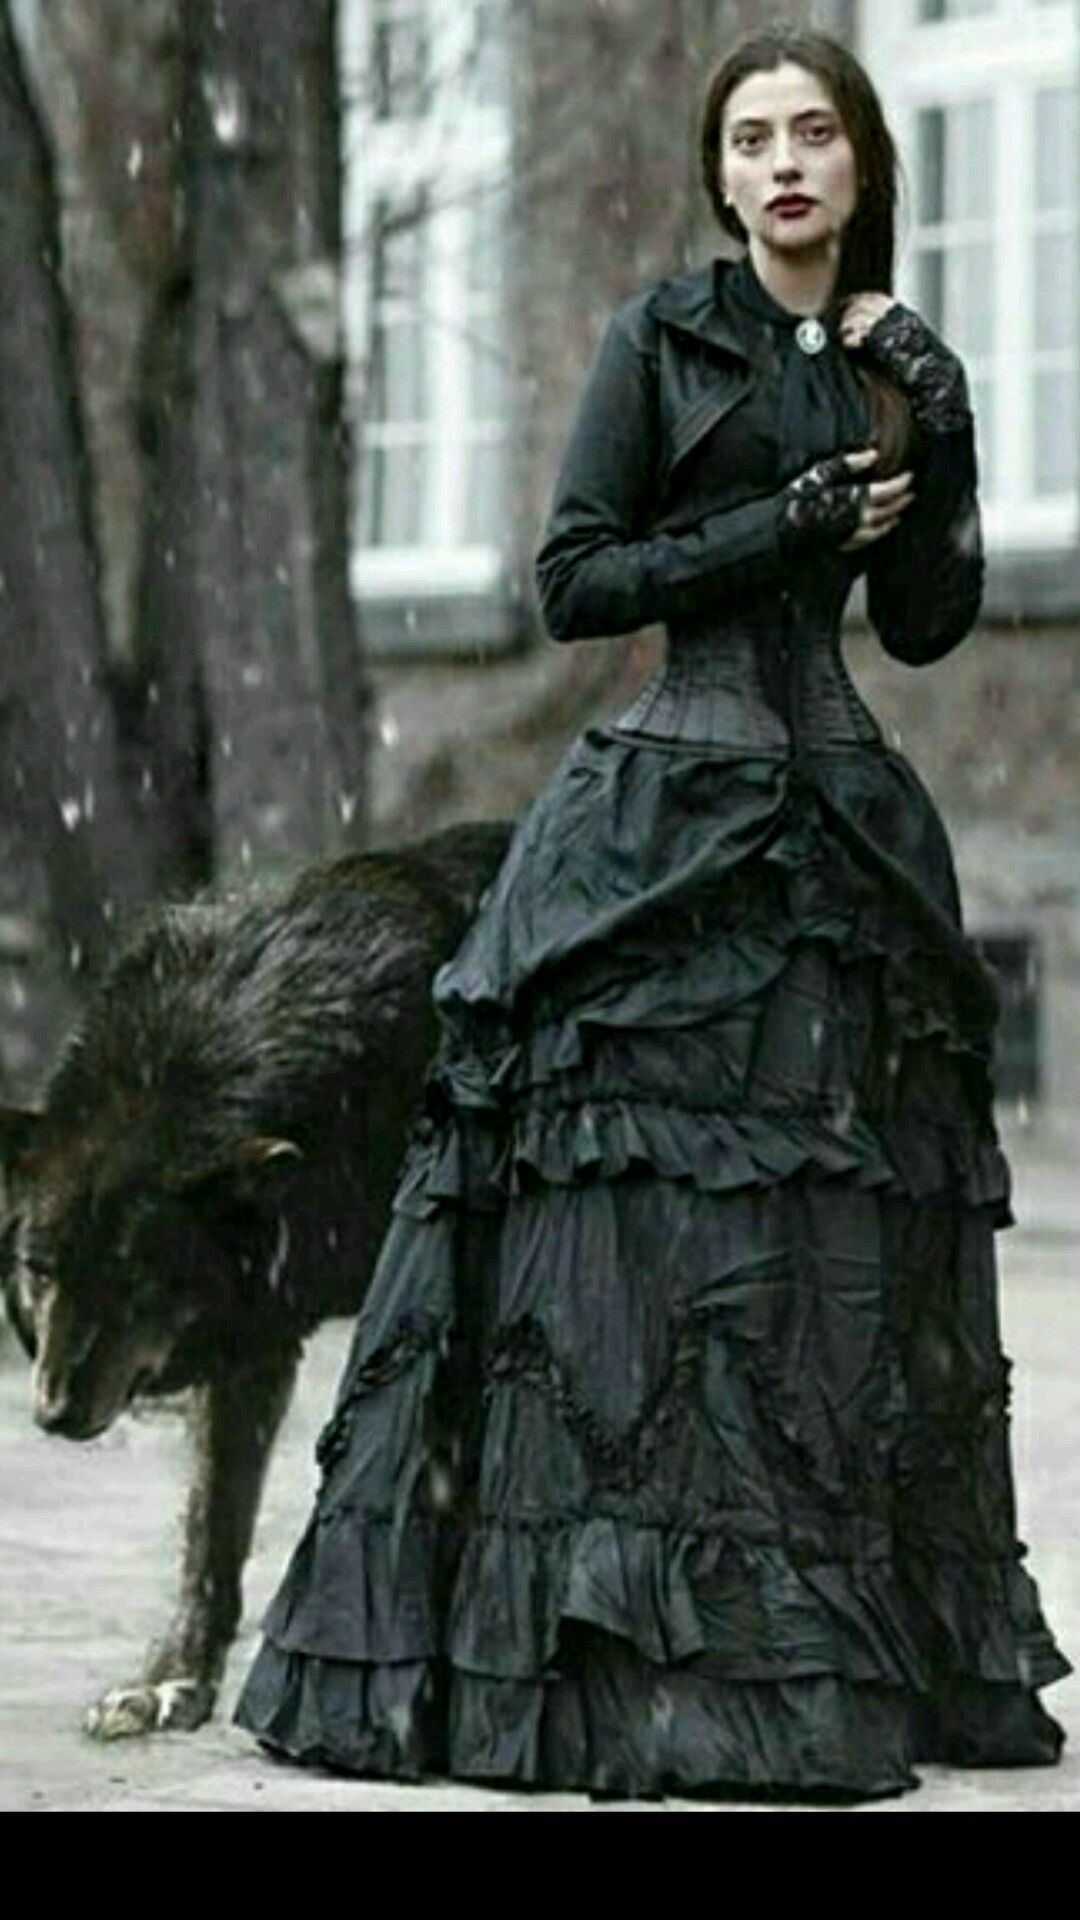 Pin von Rosita Spinozzi auf Gothic reminiscences | Pinterest | Oscar ...